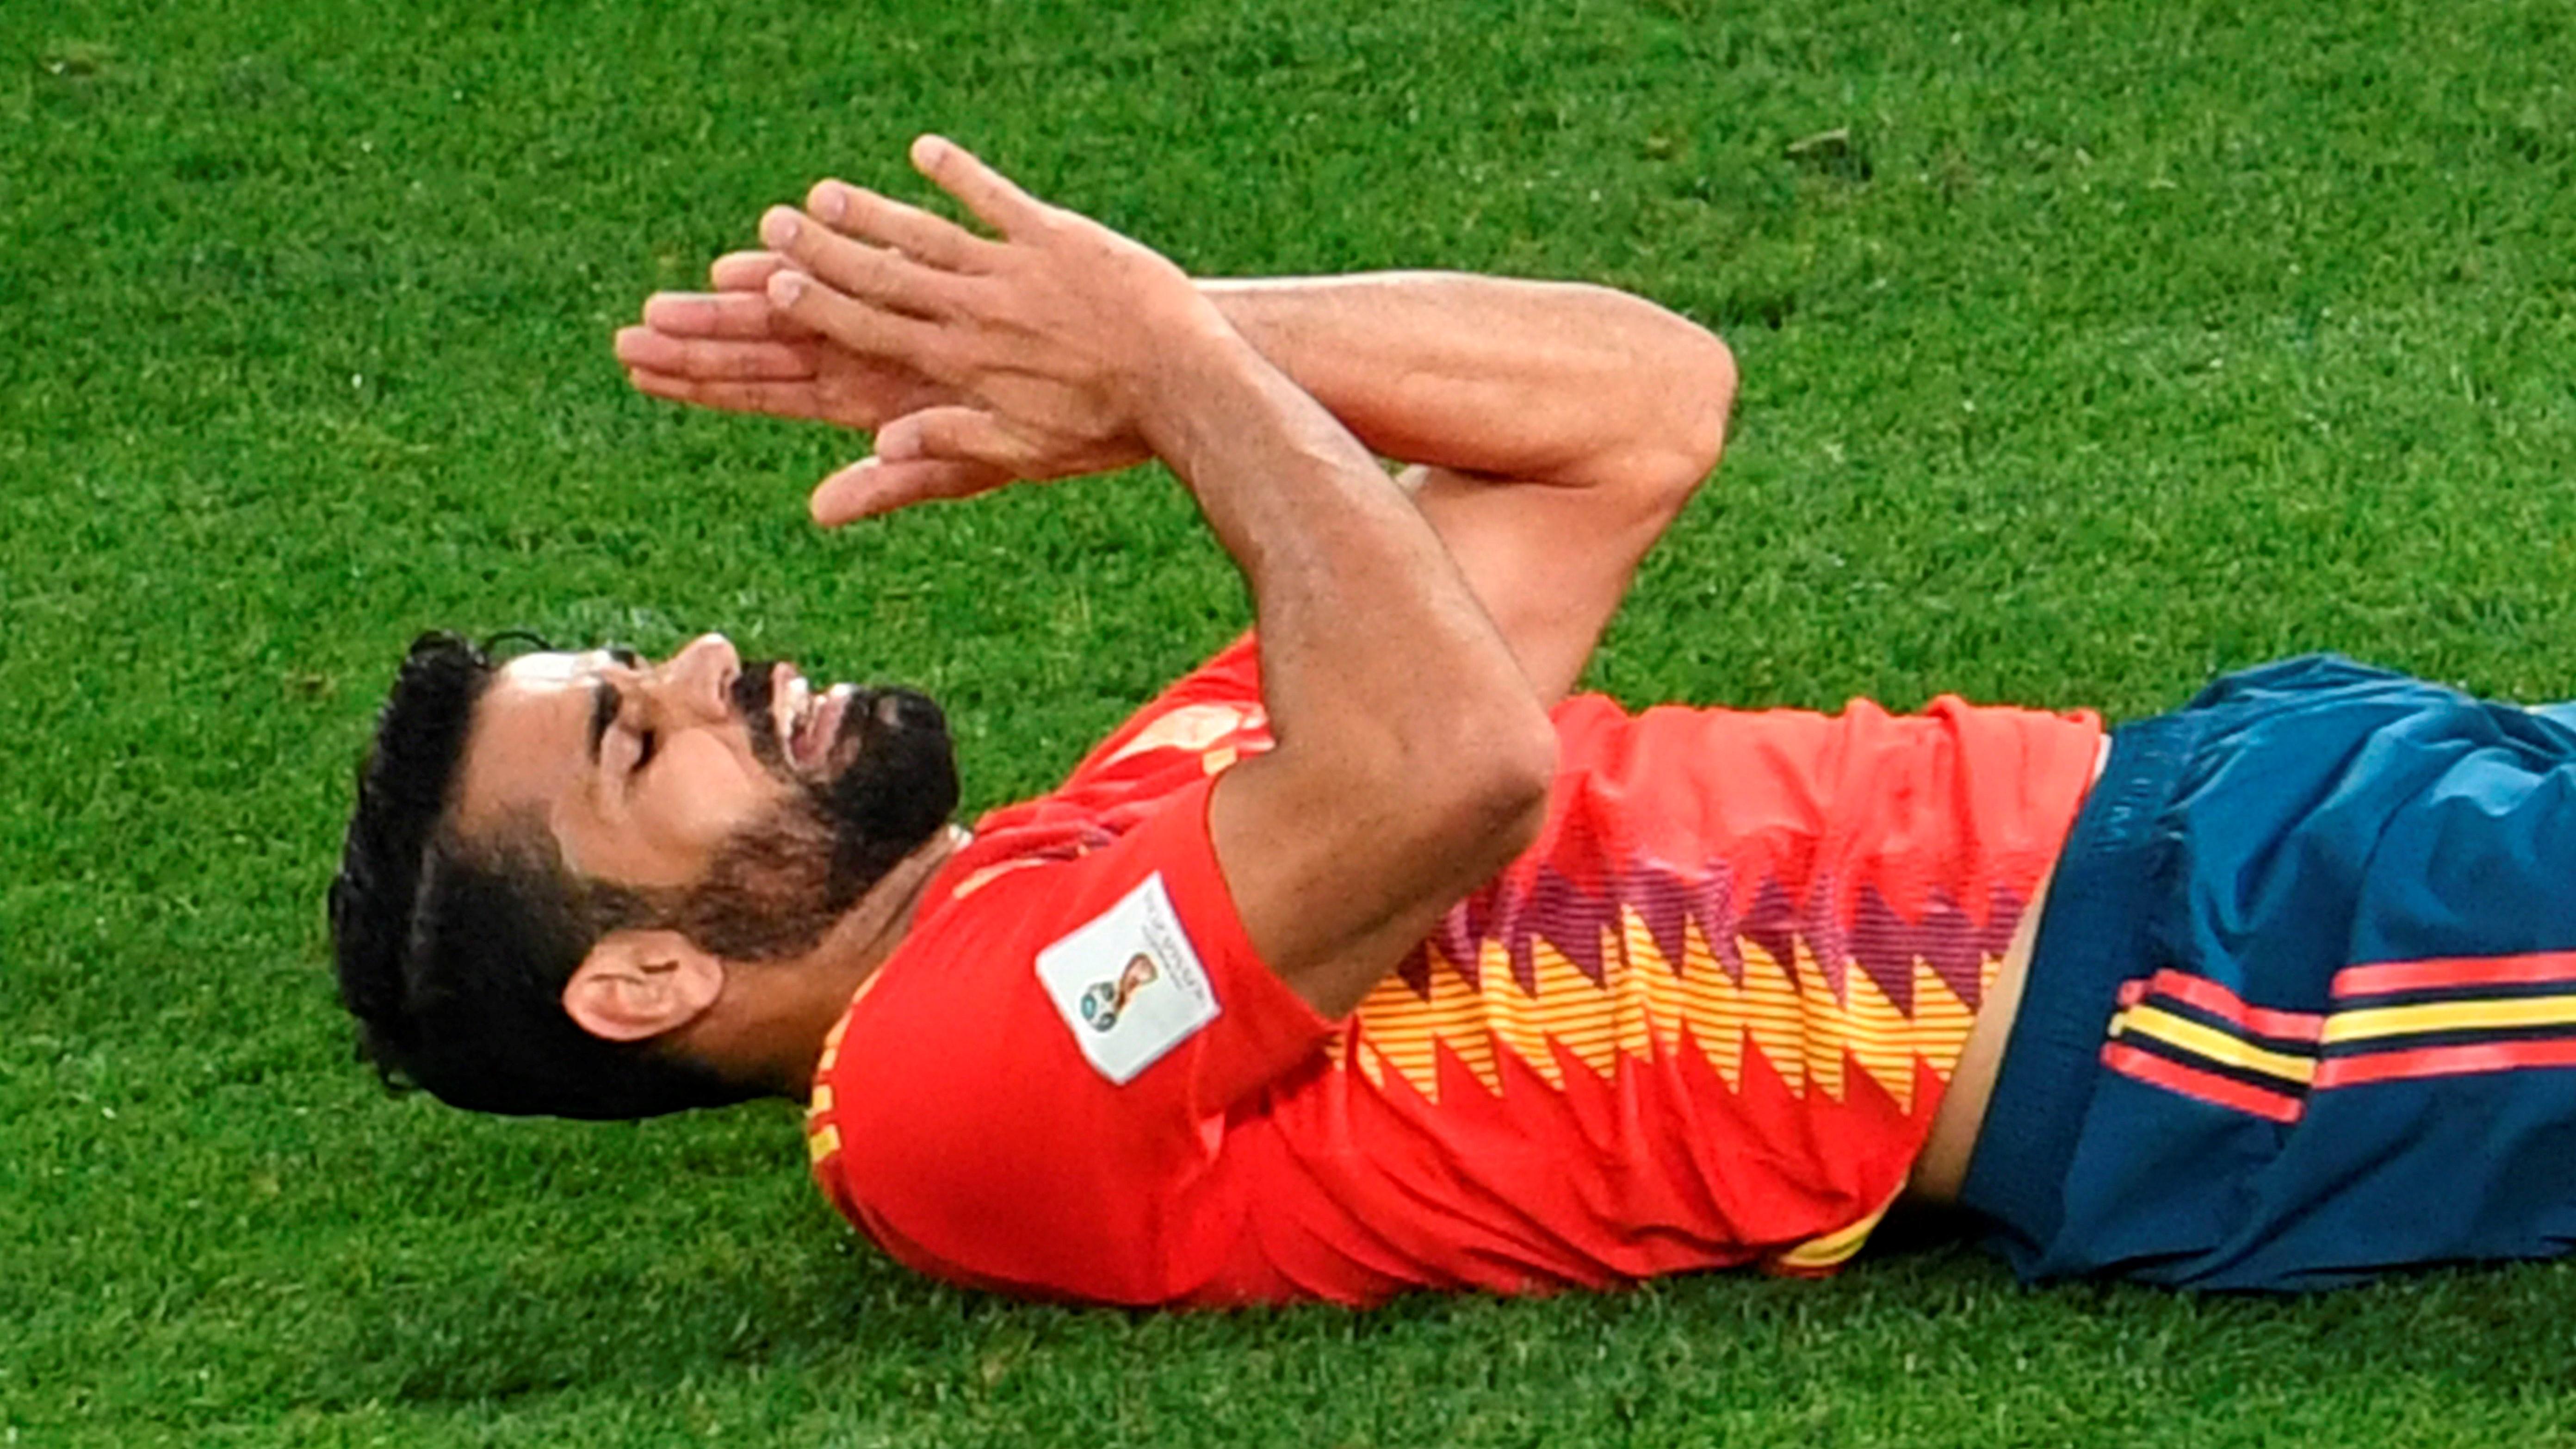 Diego Costa Spain Morocco España Marruecos 25062018